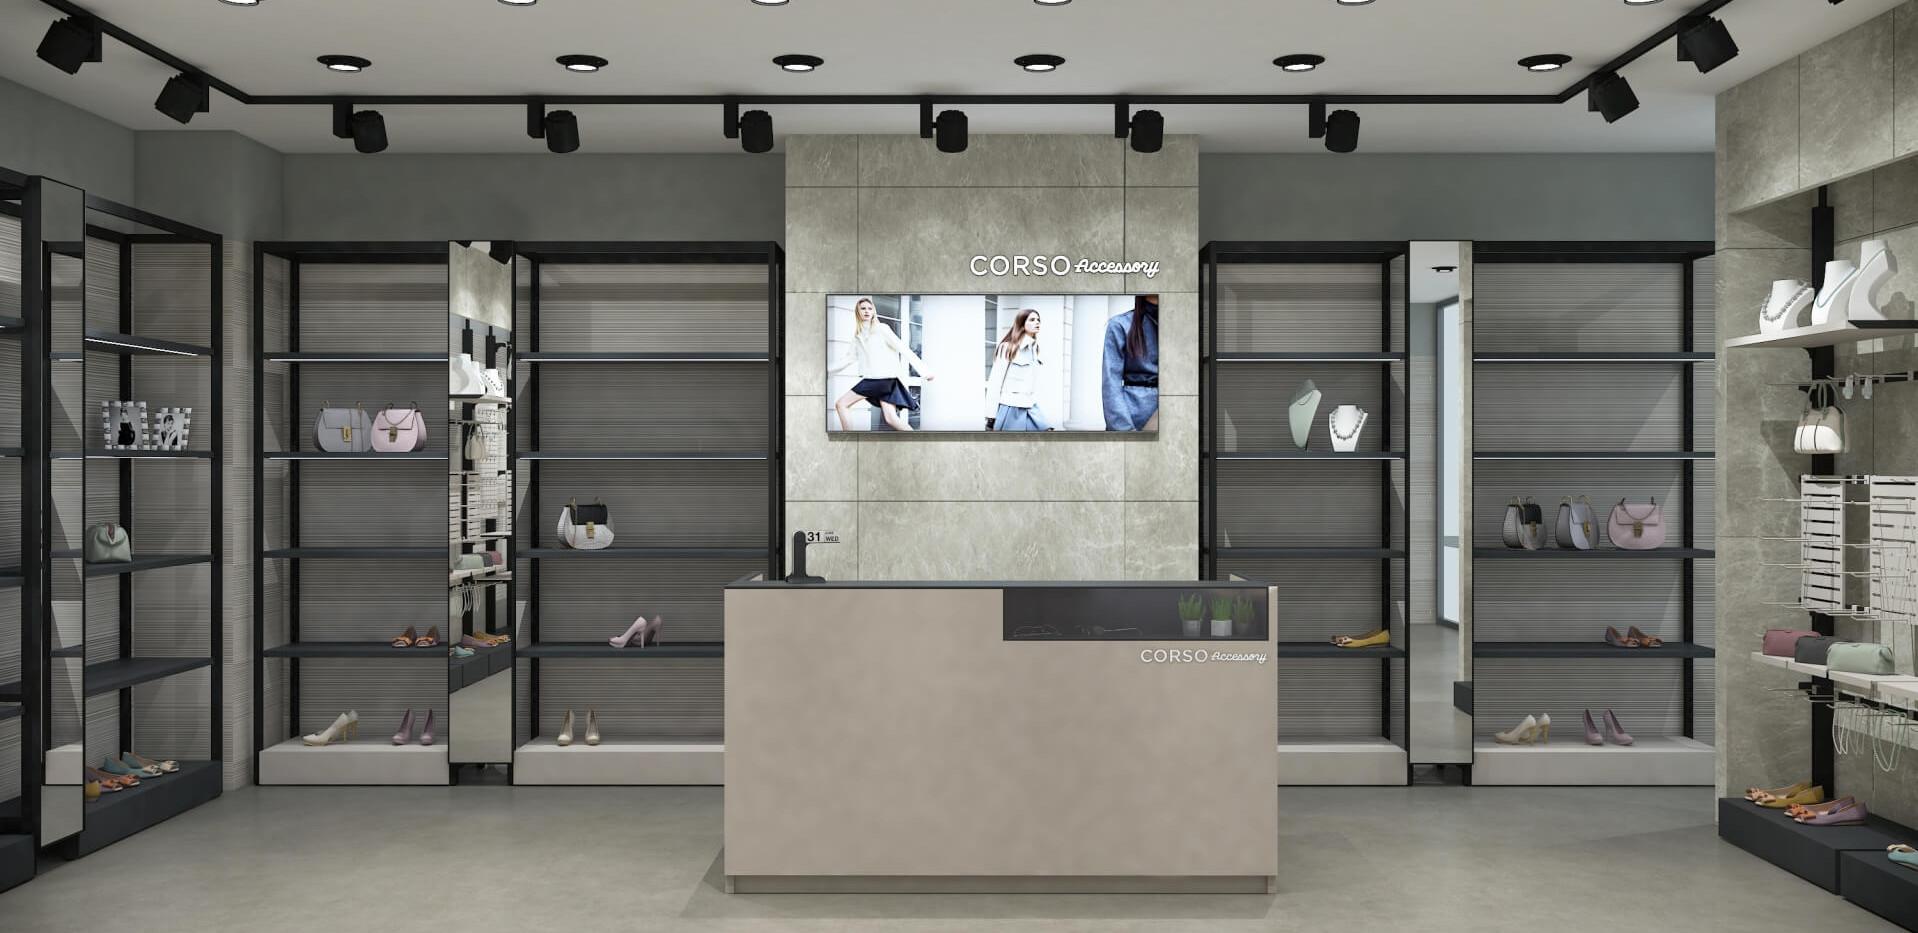 Corso - Shoes Store Shop Design-1.jpg